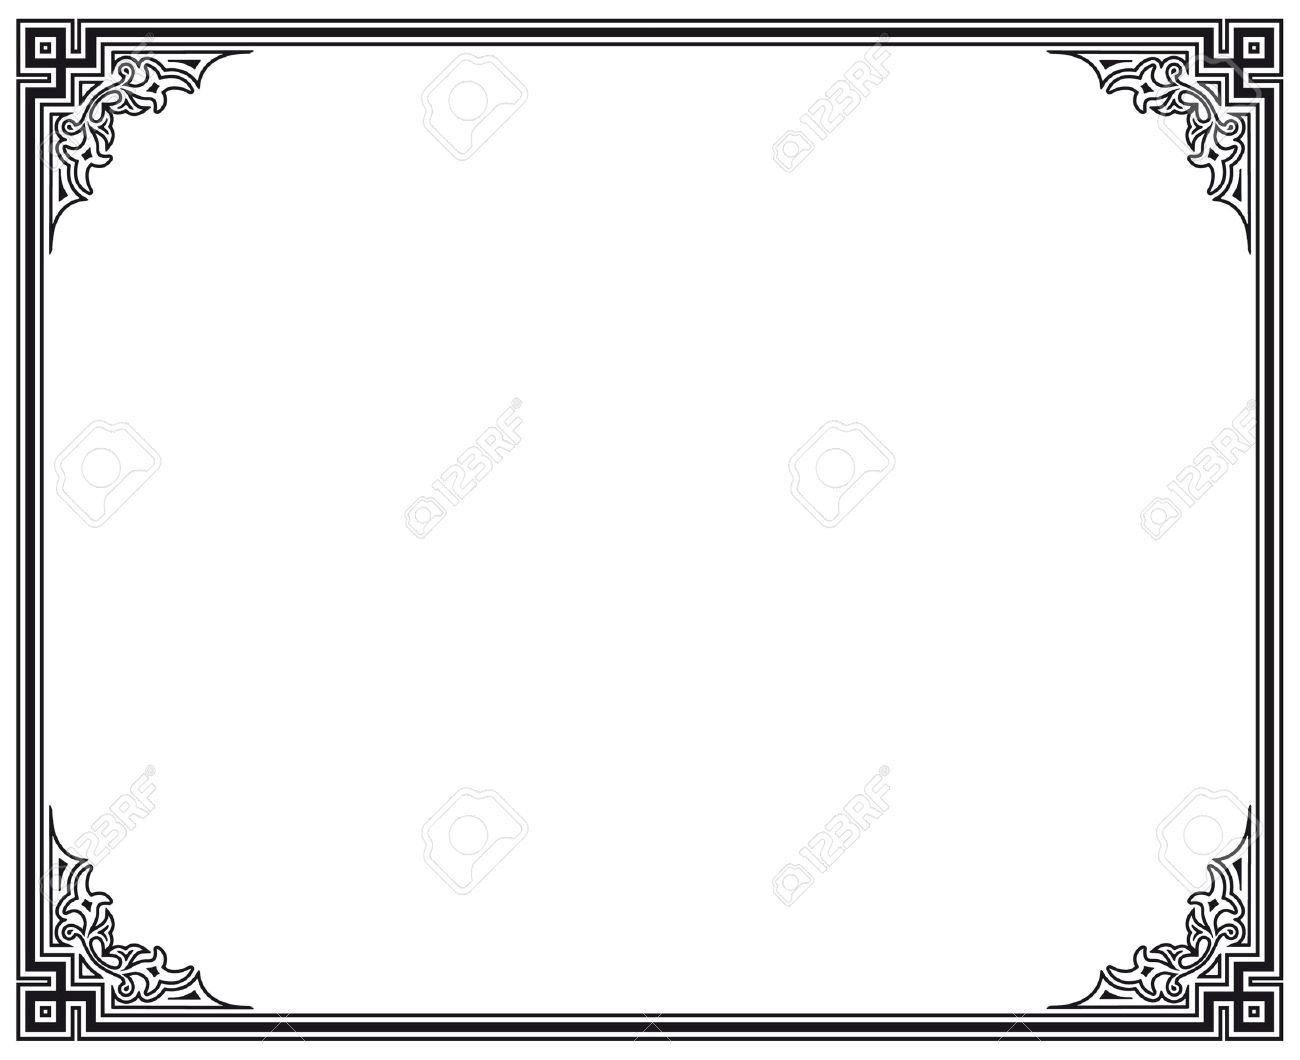 black and white vector frame Stock Vector - 14827850